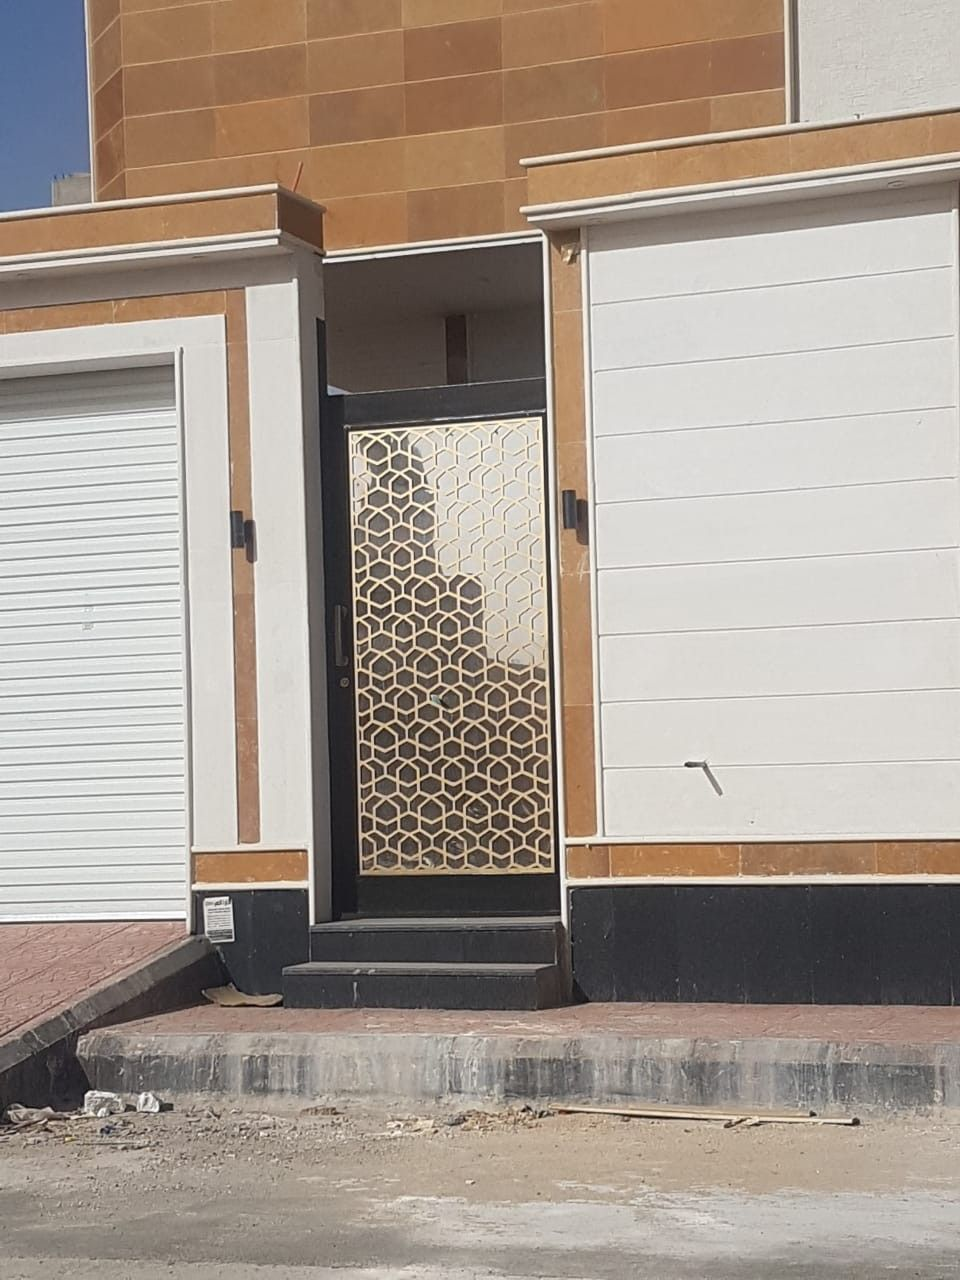 Laserdoors Metaldoors Lasercut Riyadhdoors Caddesign Arabiandoors Gate Gatedesign Door Doors Laser Nicedoors Cnc Saudi Riyadh Home Outdoor Decor Design Decor